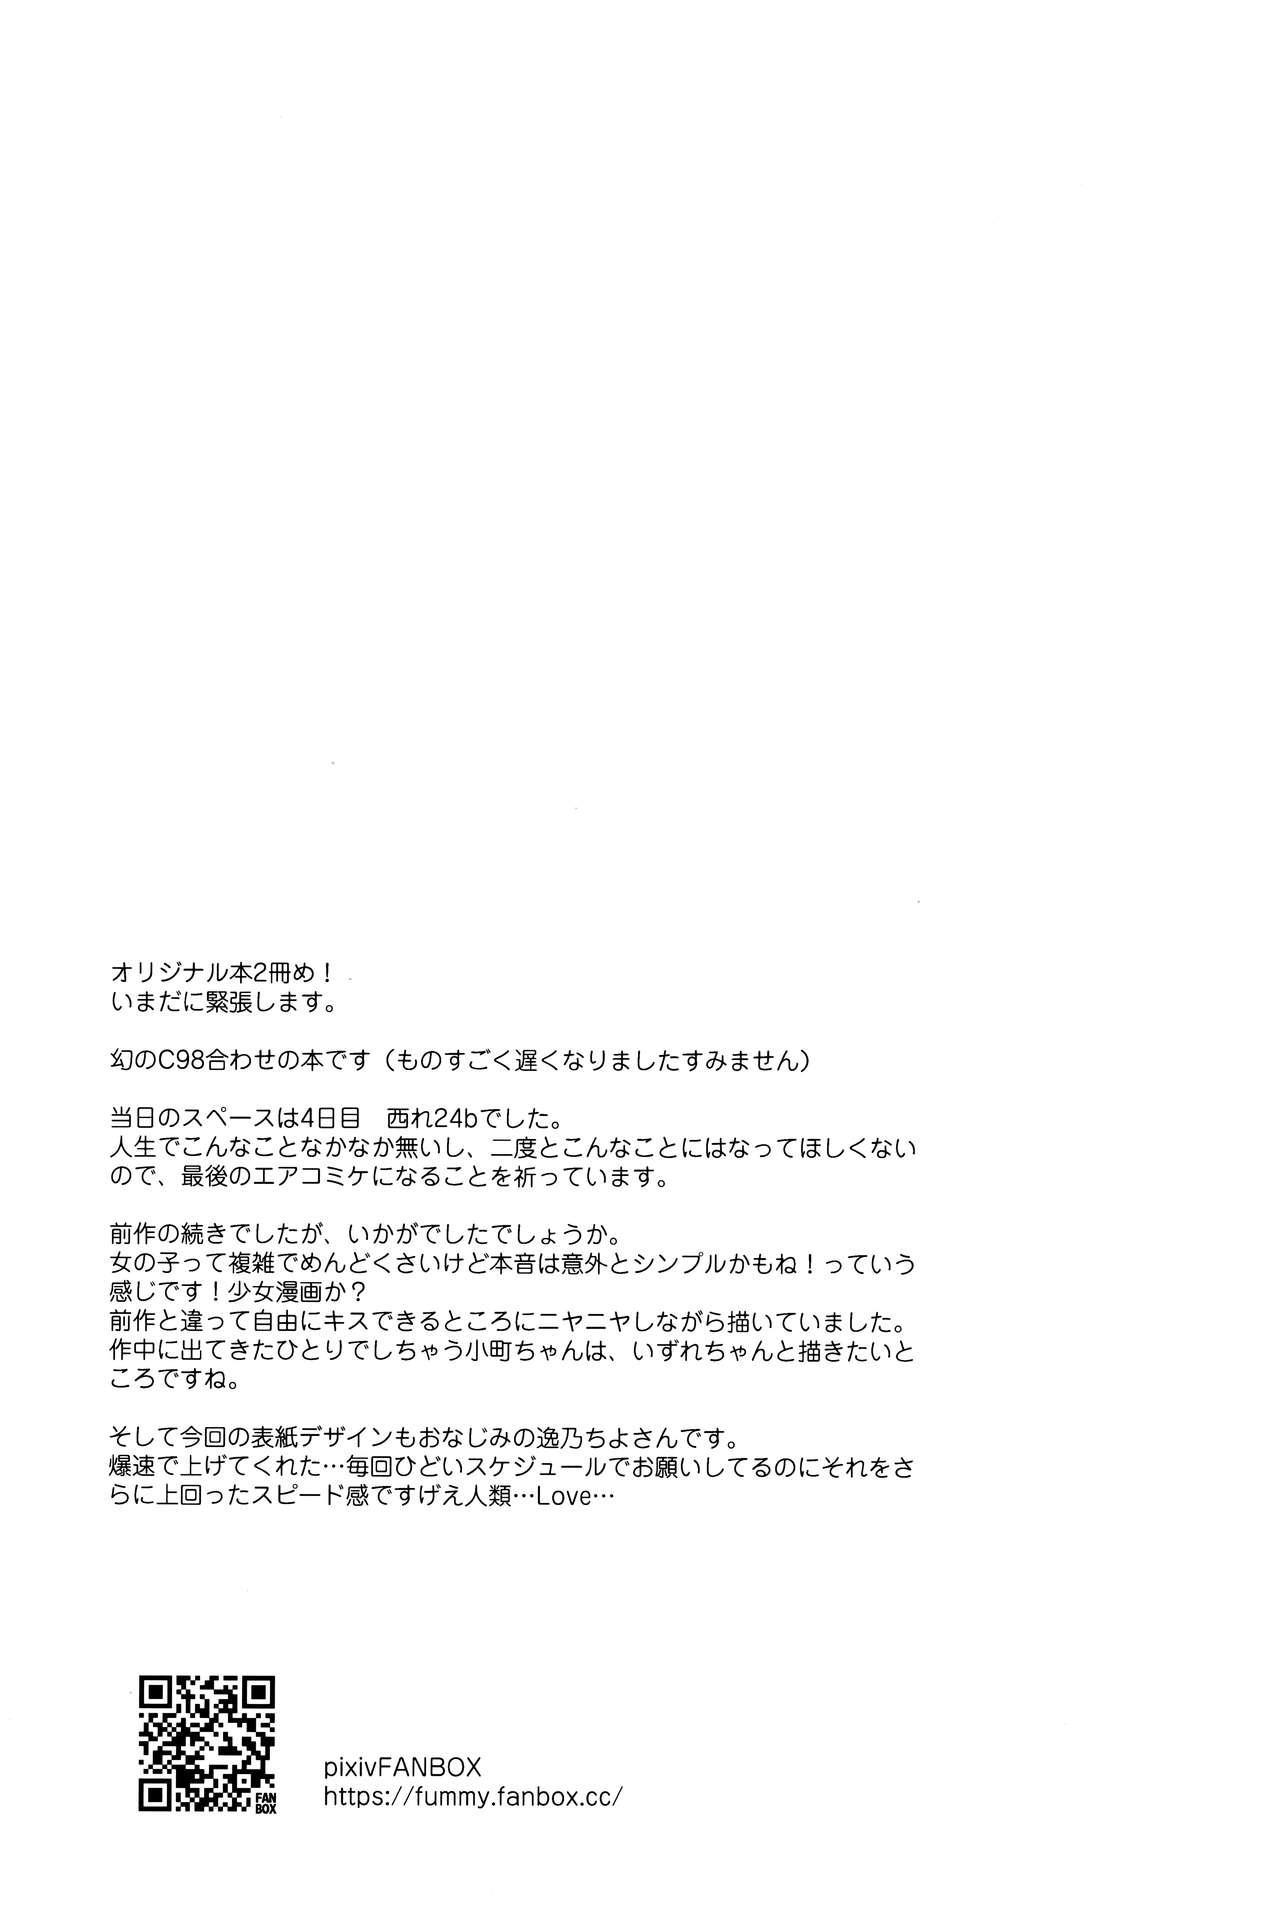 Boku-tachi wa, Koi o Shitenai Hazu datta. | We Are Not in Love, That's What I Thought 23